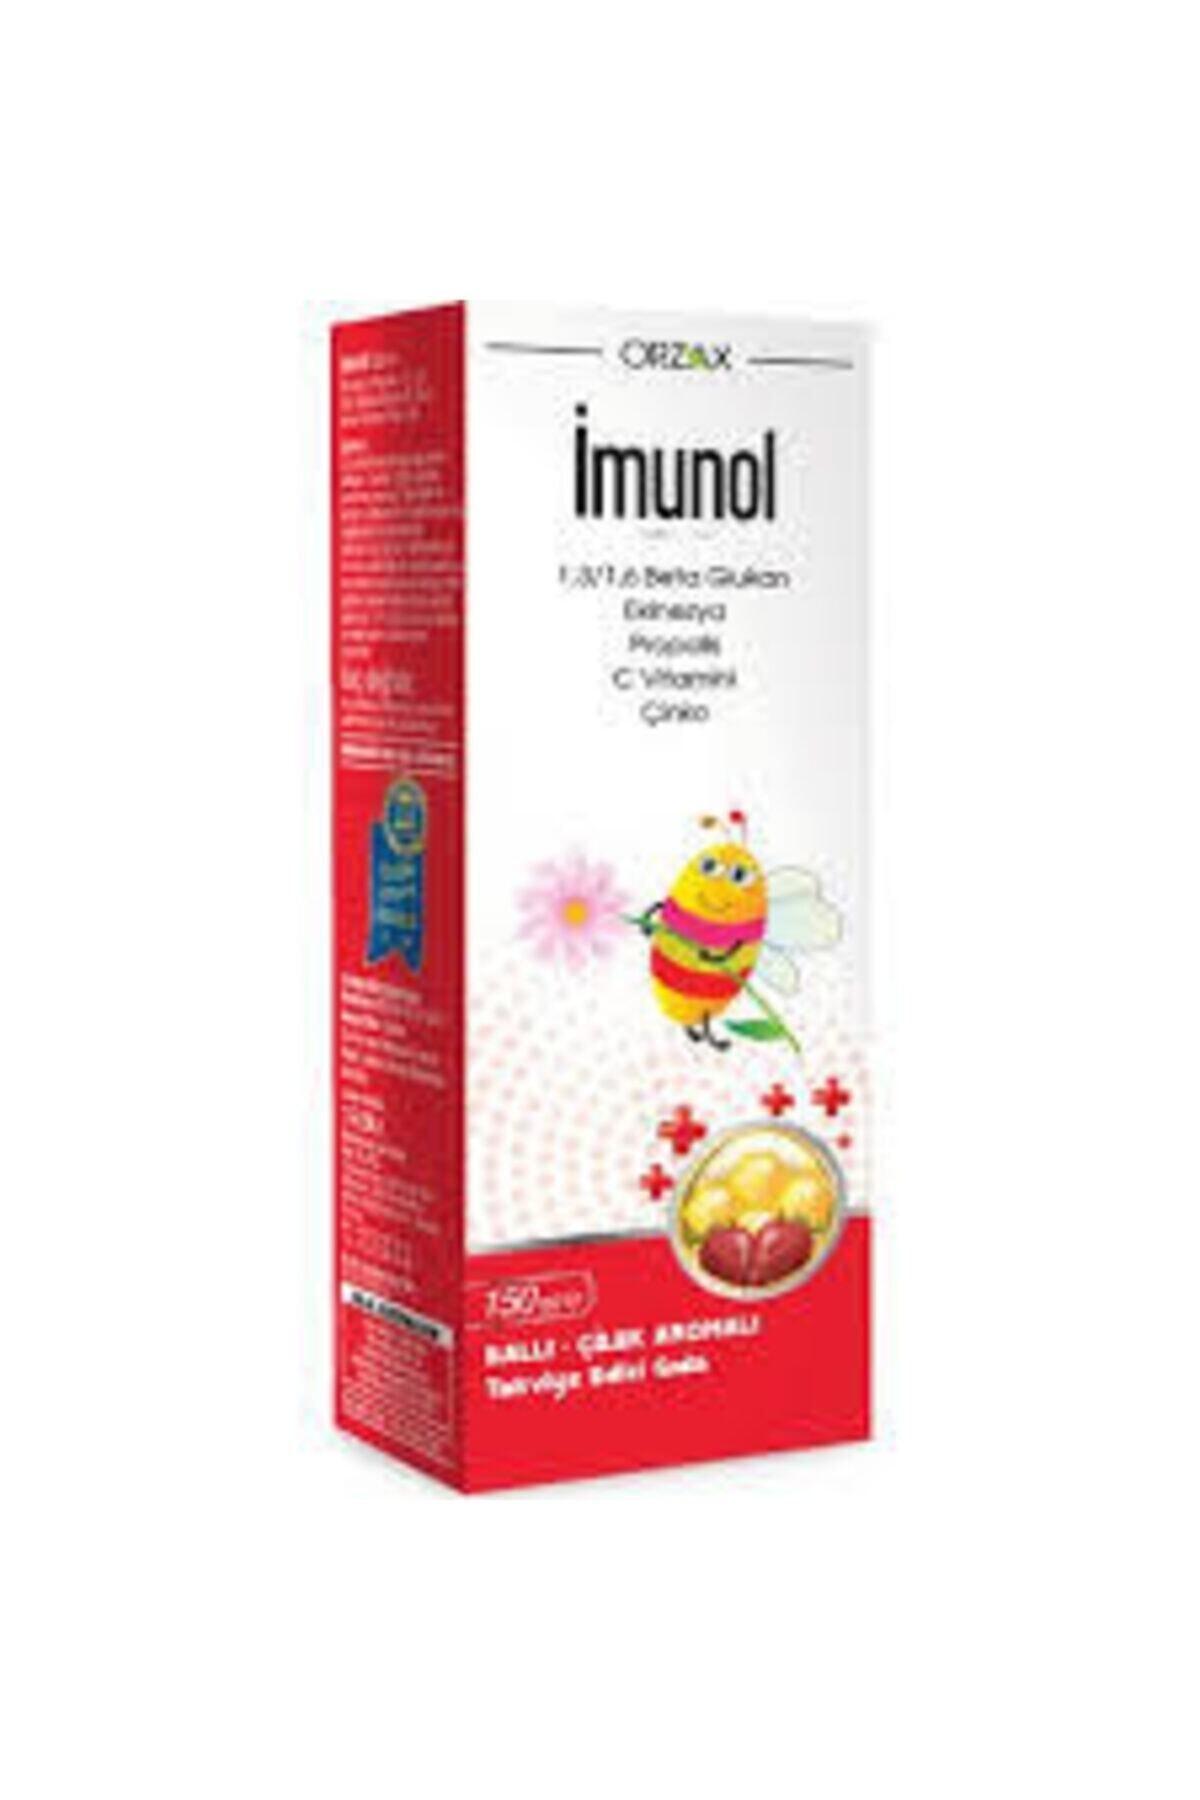 Orzax Imunol Ballı Çilek Aromalı Şurup 2